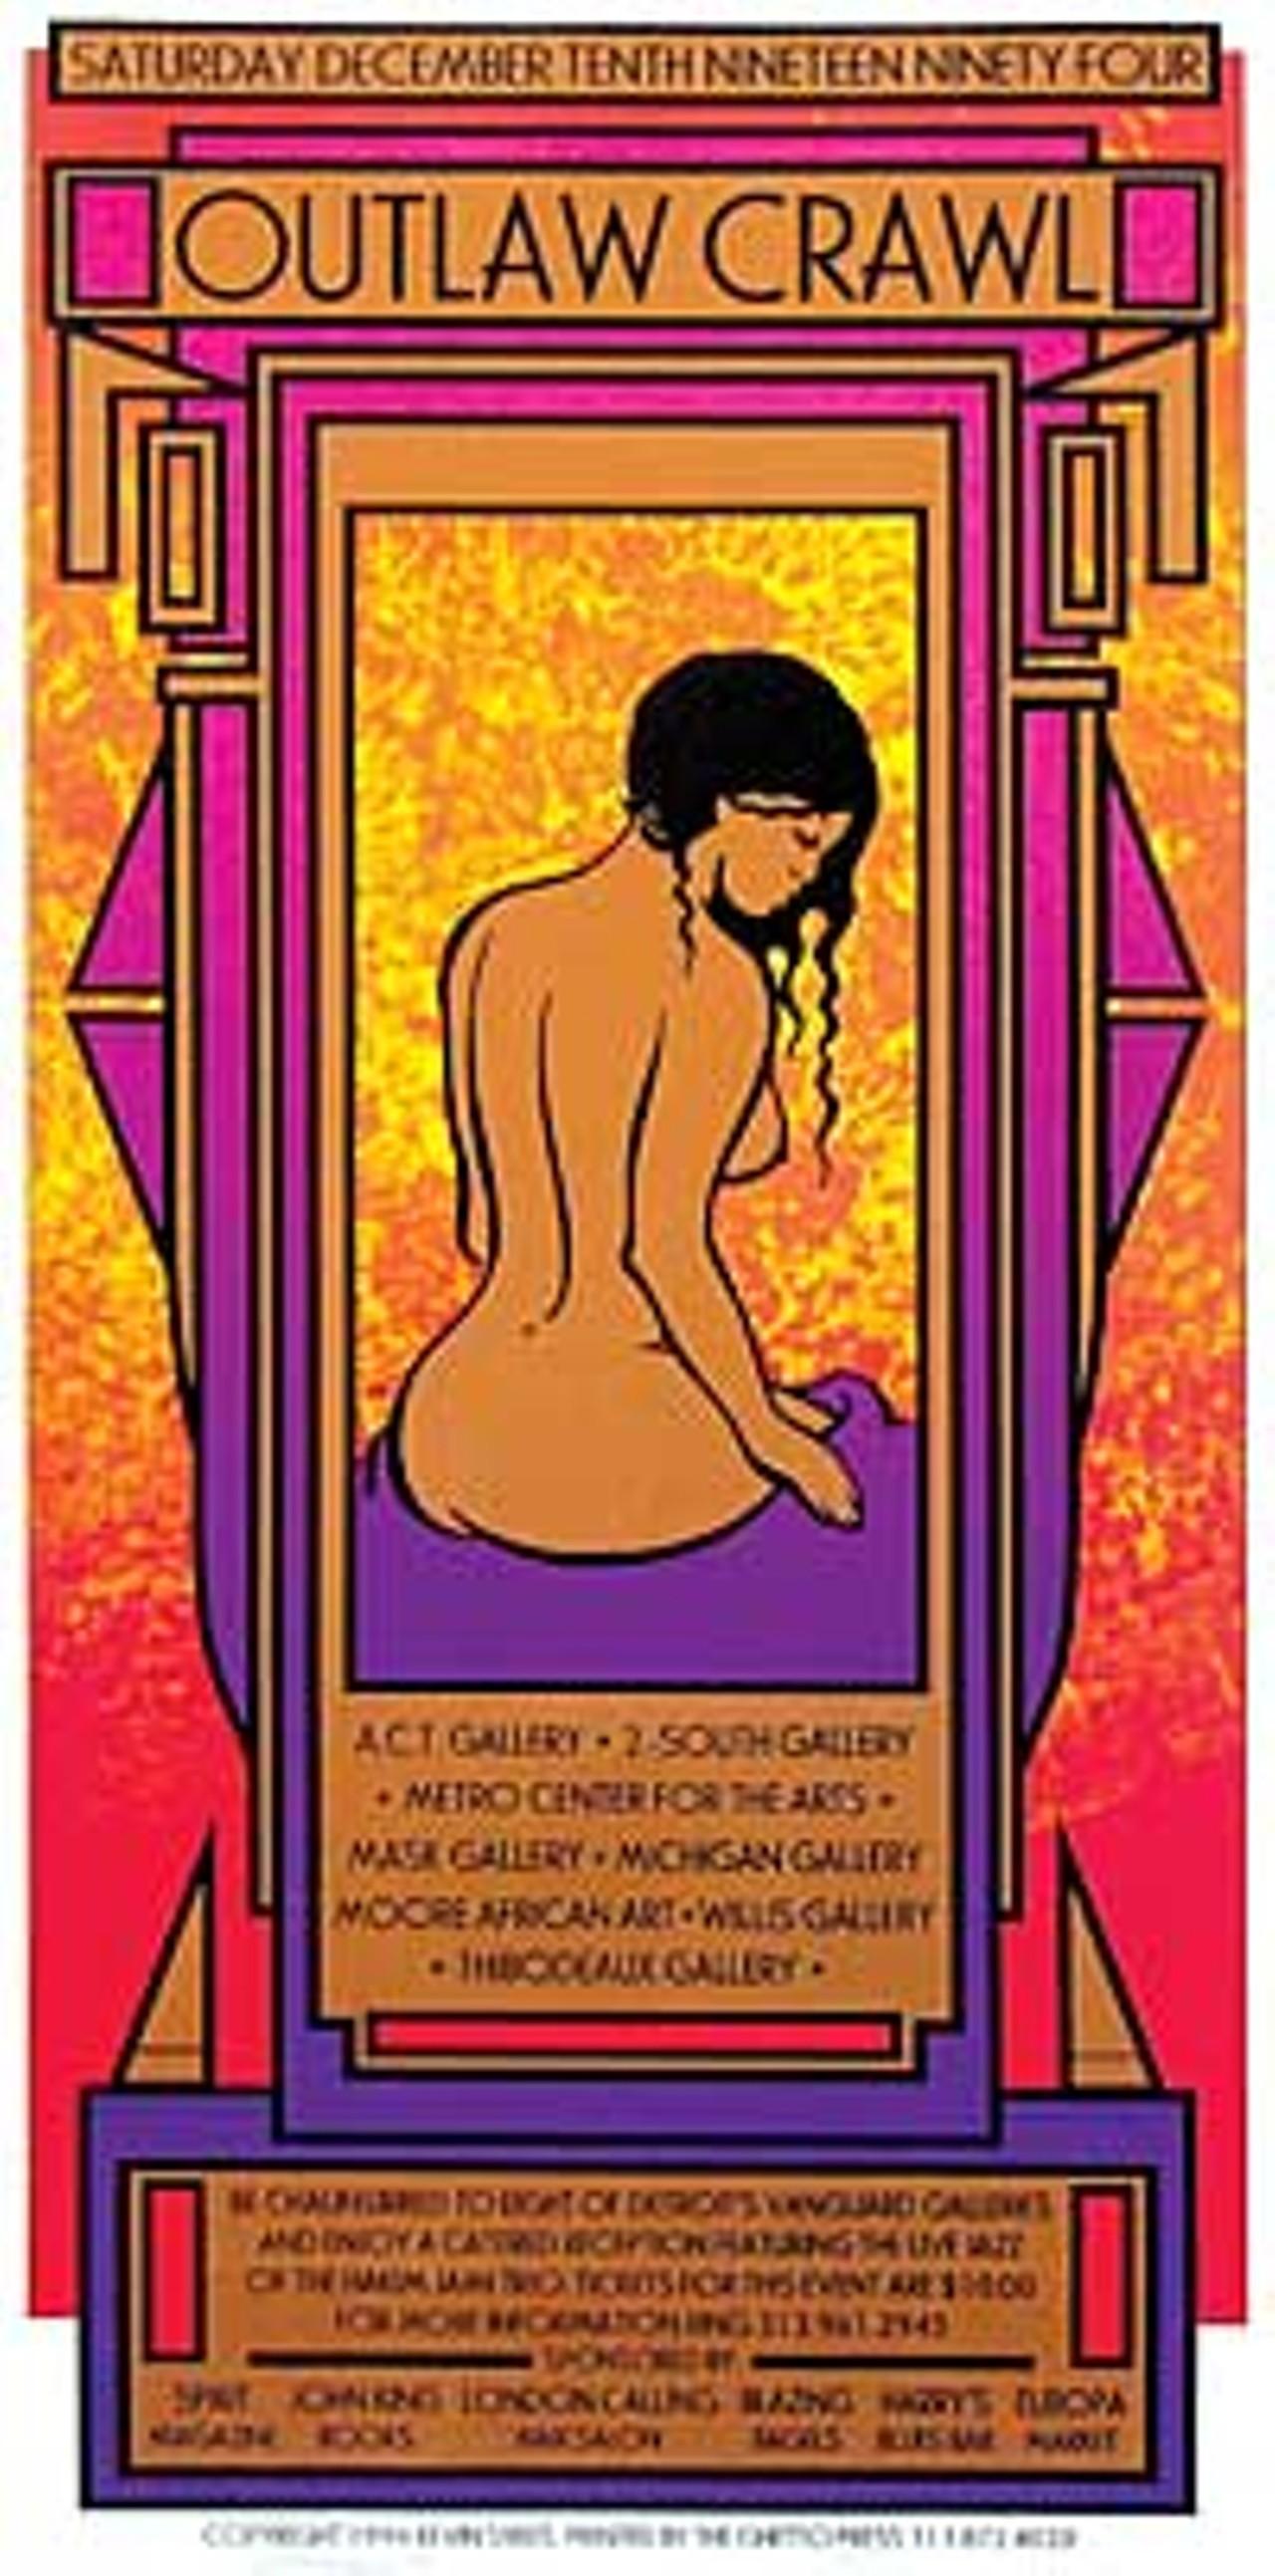 Gonzalo valenzuela porno